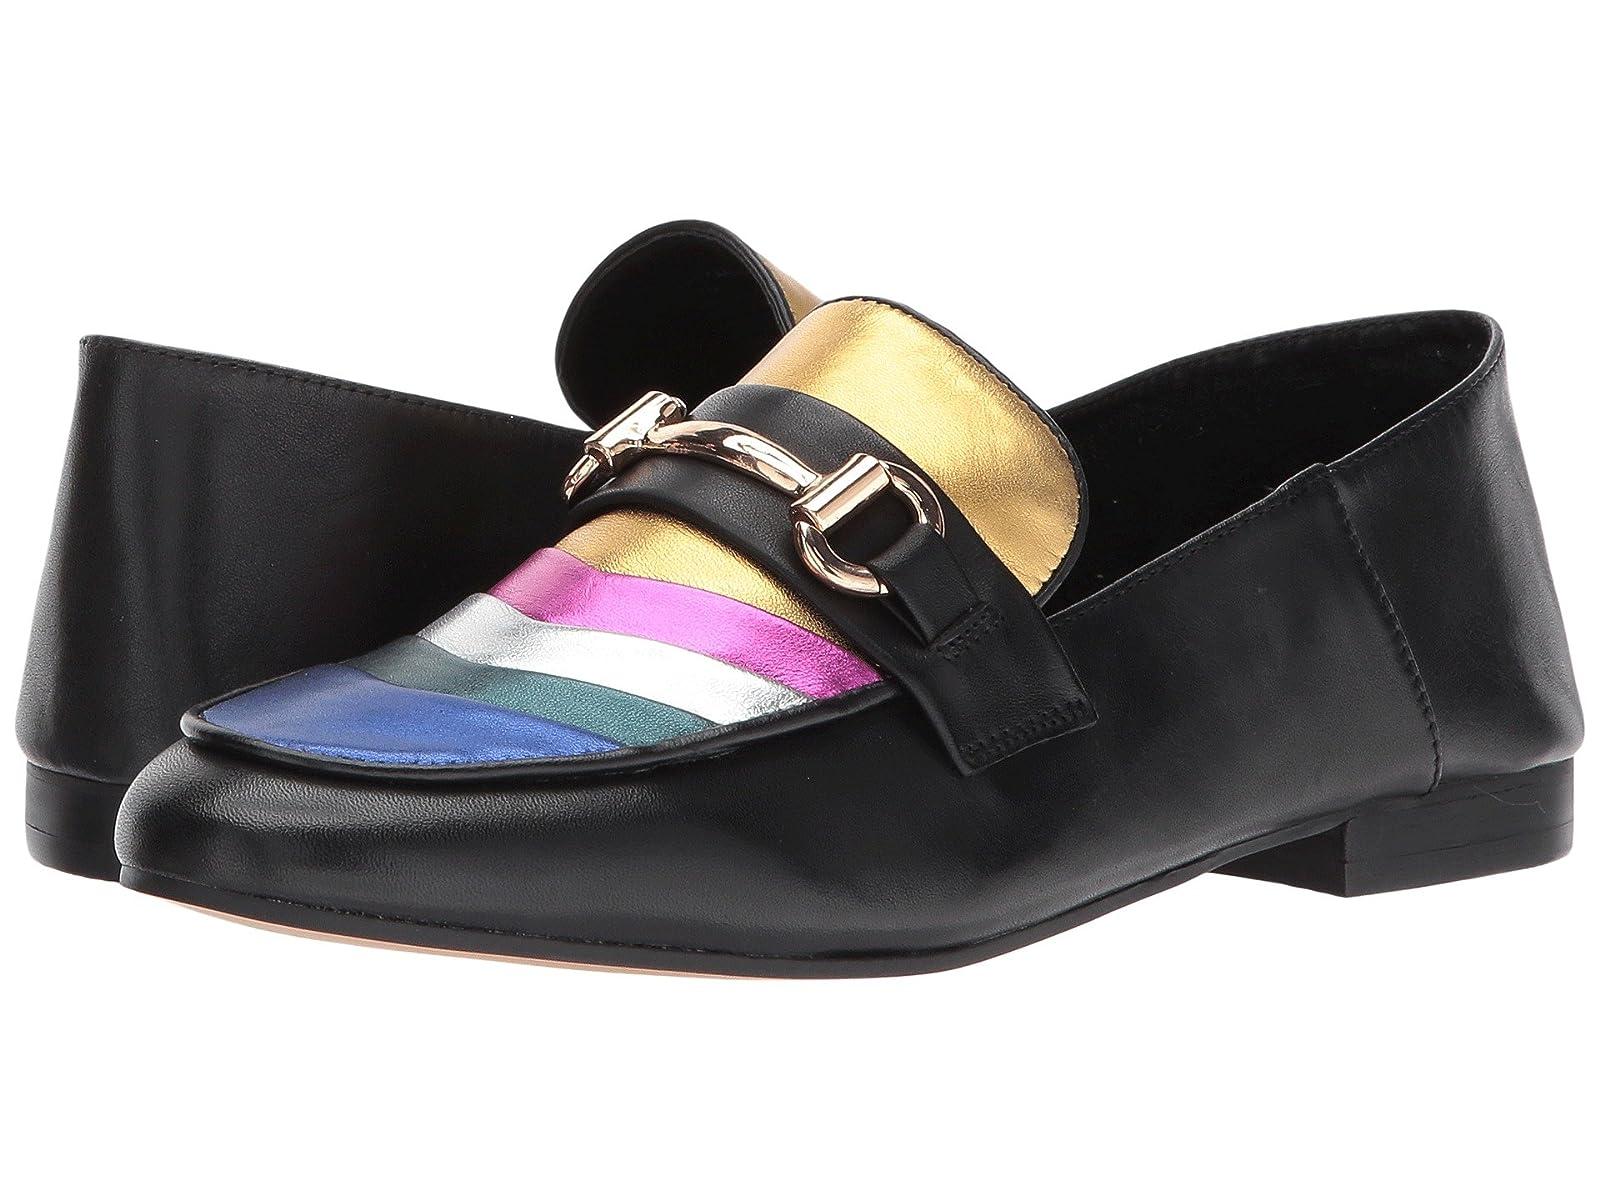 Steven Santana-CCheap and distinctive eye-catching shoes